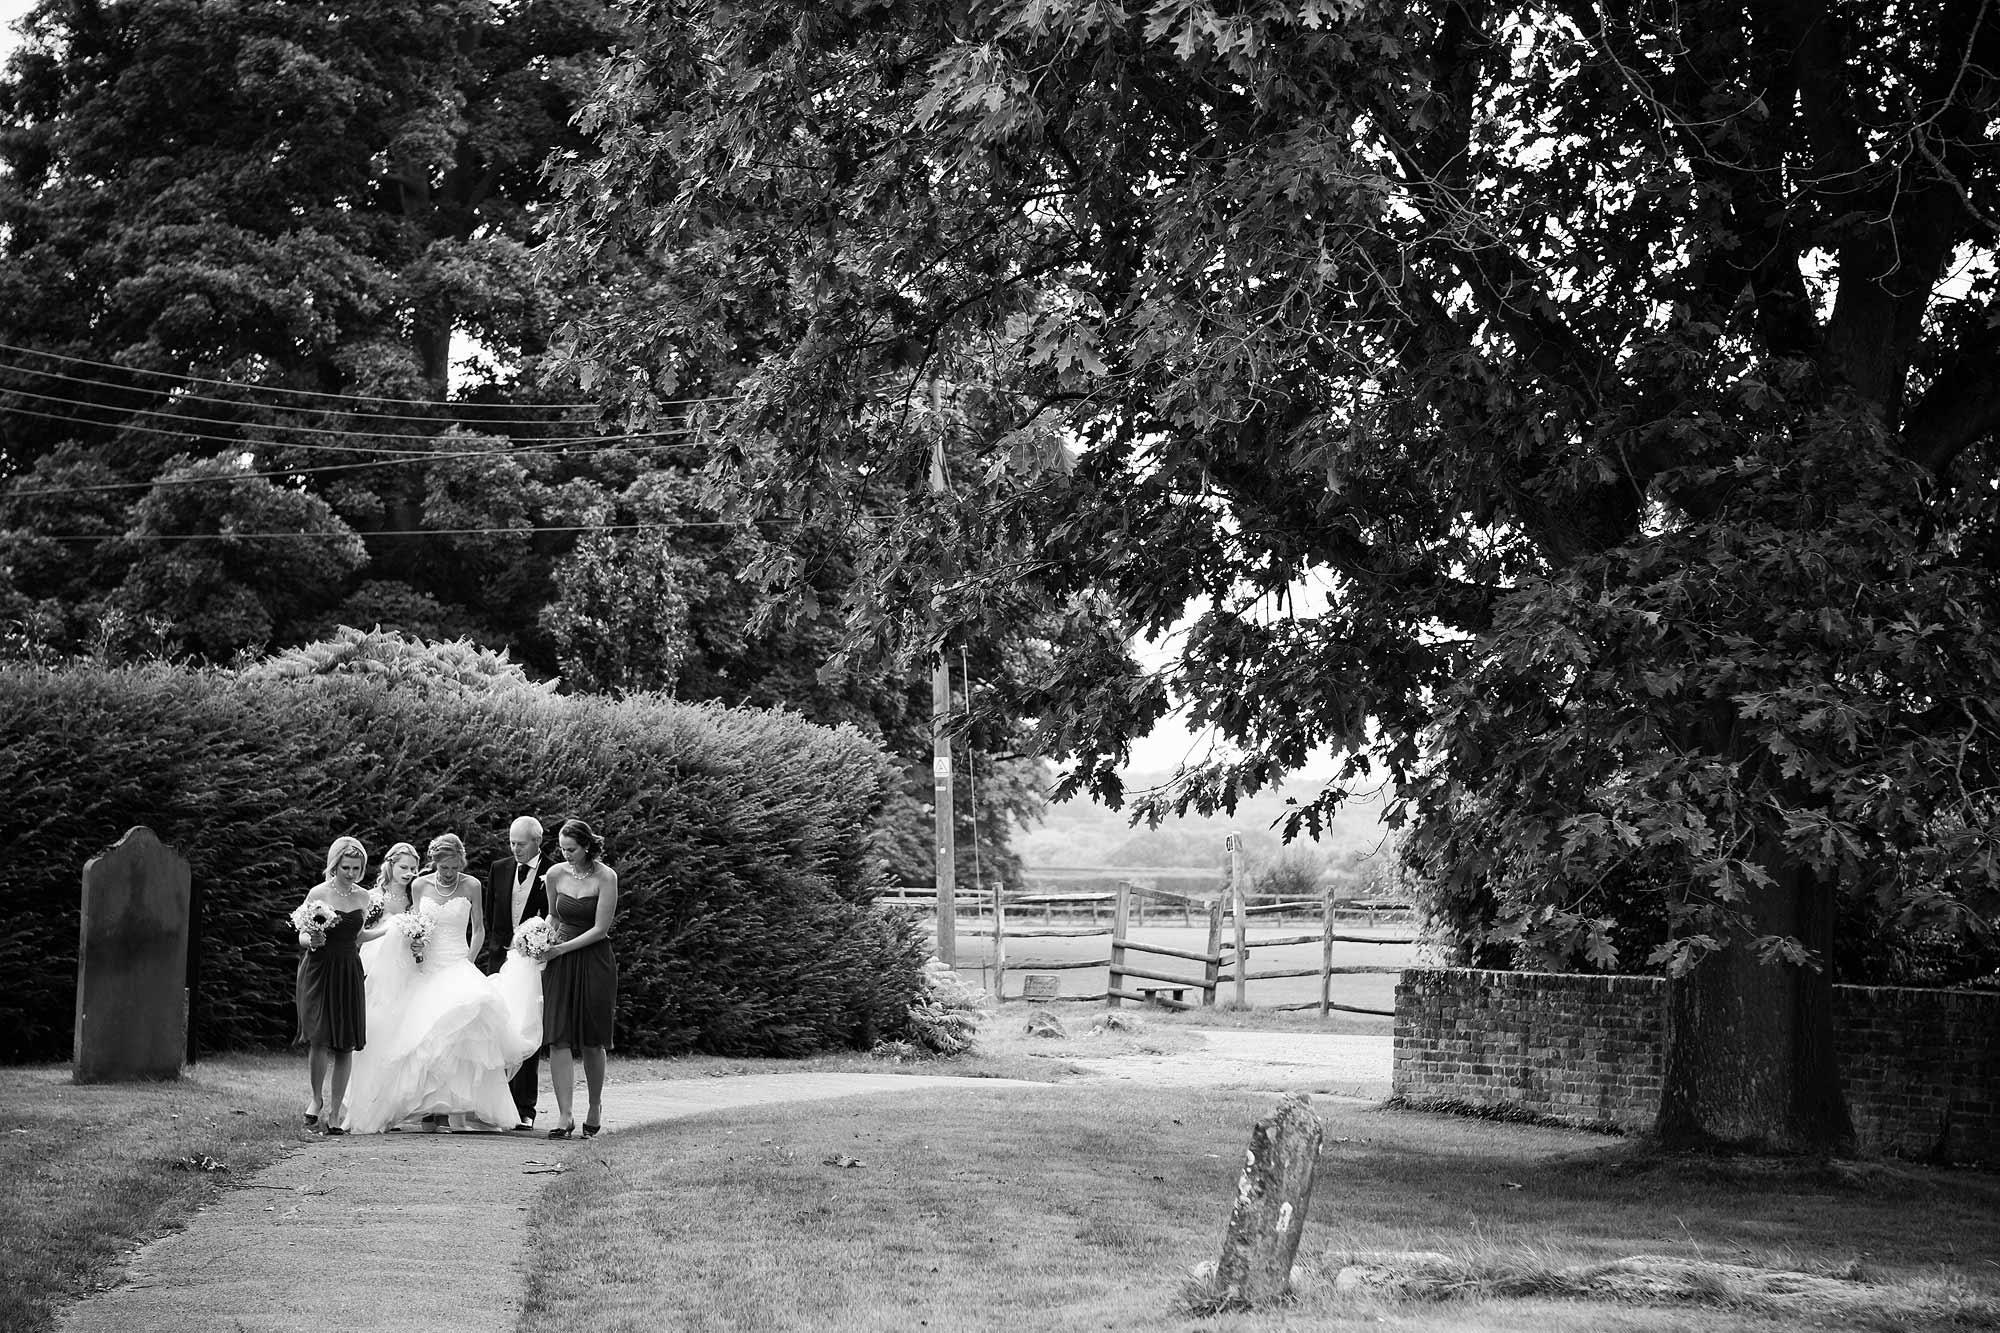 bromley wedding photography